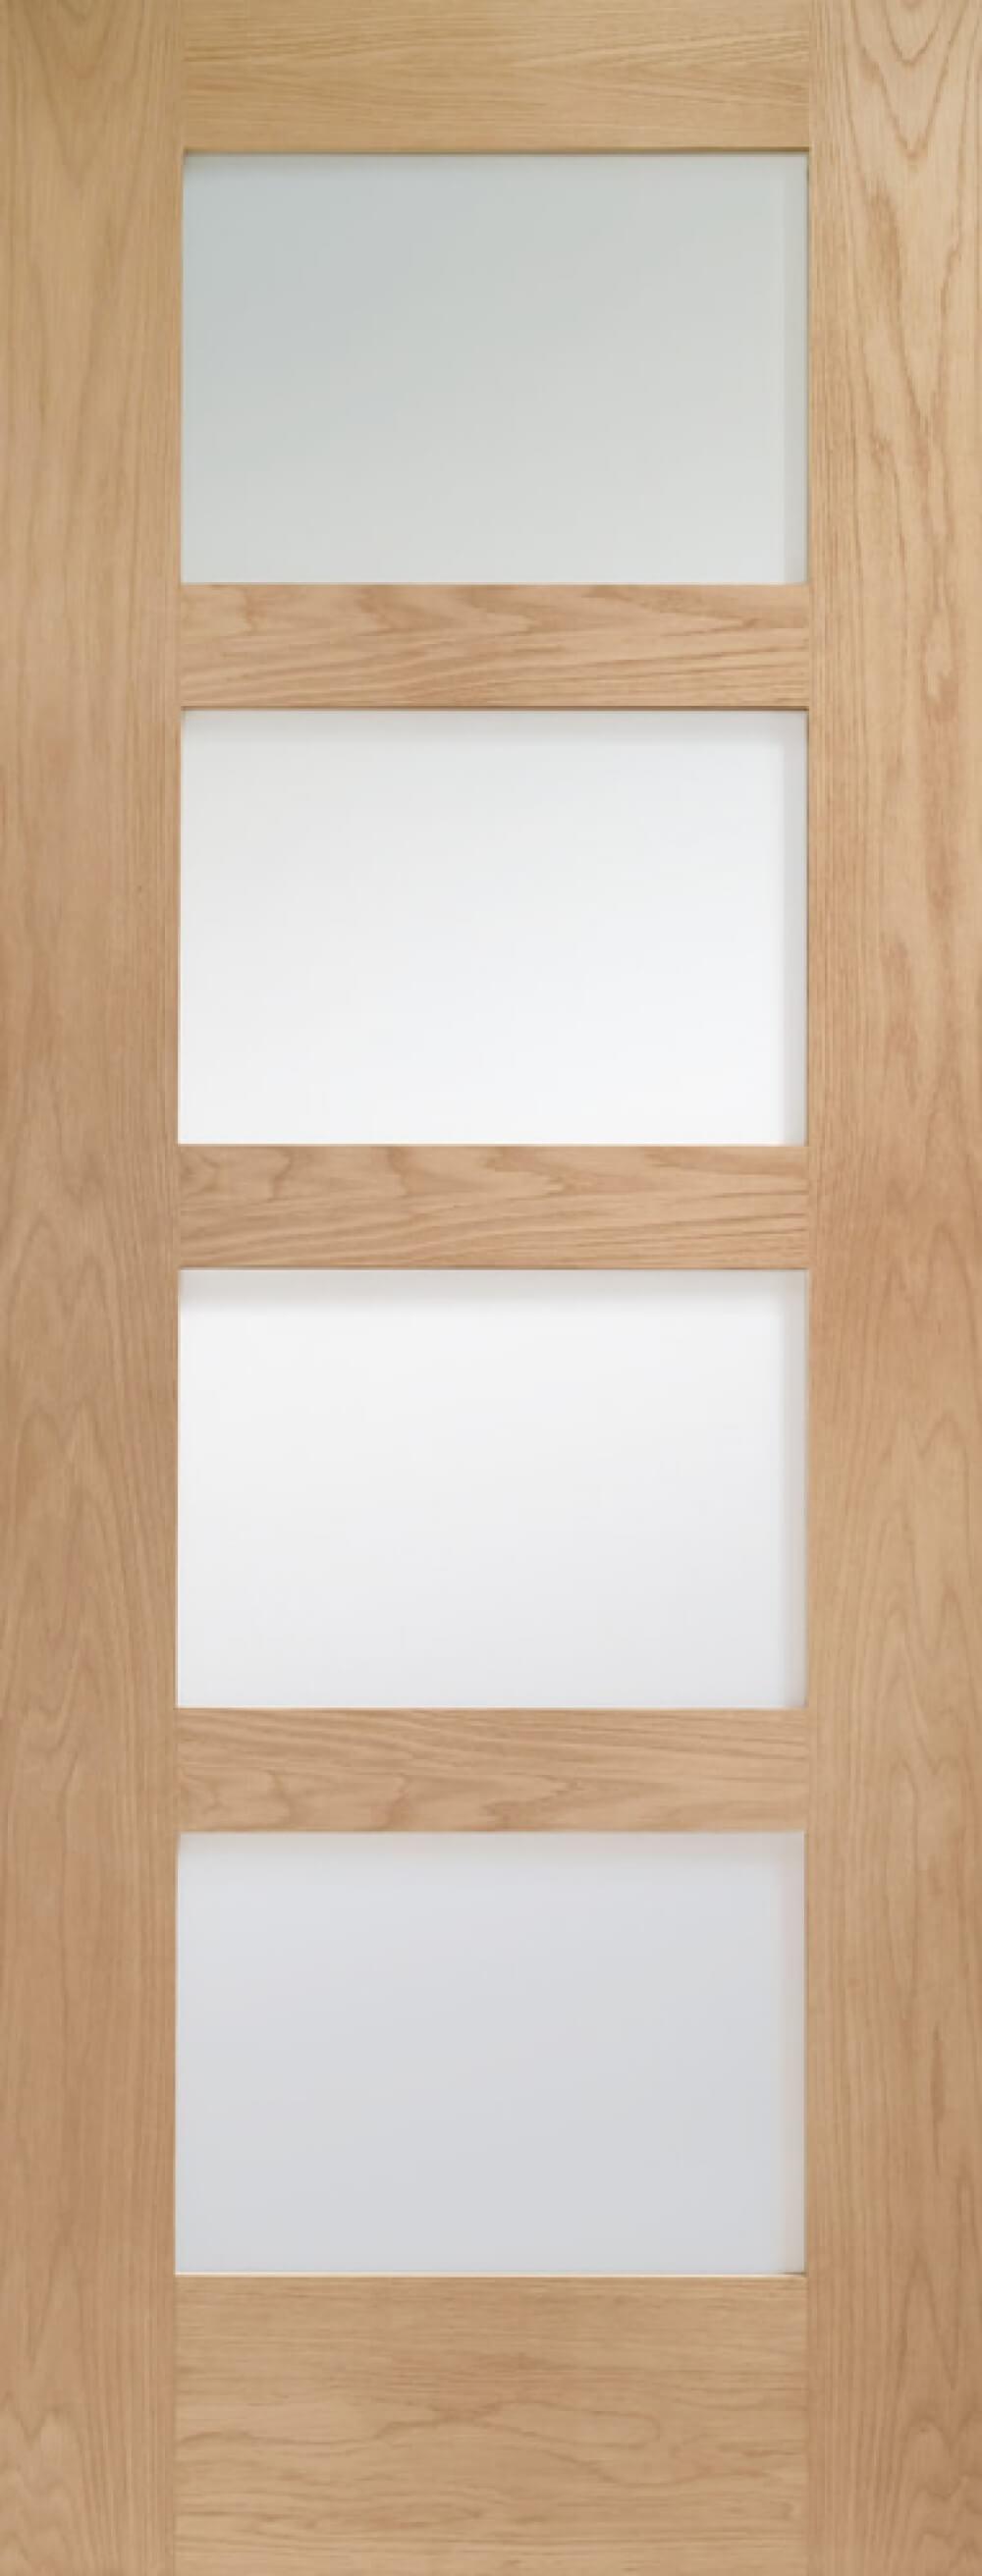 Shaker 4 Light Oak Glazed Doors Obscure Glazed Fire Doors Vibrant Doors